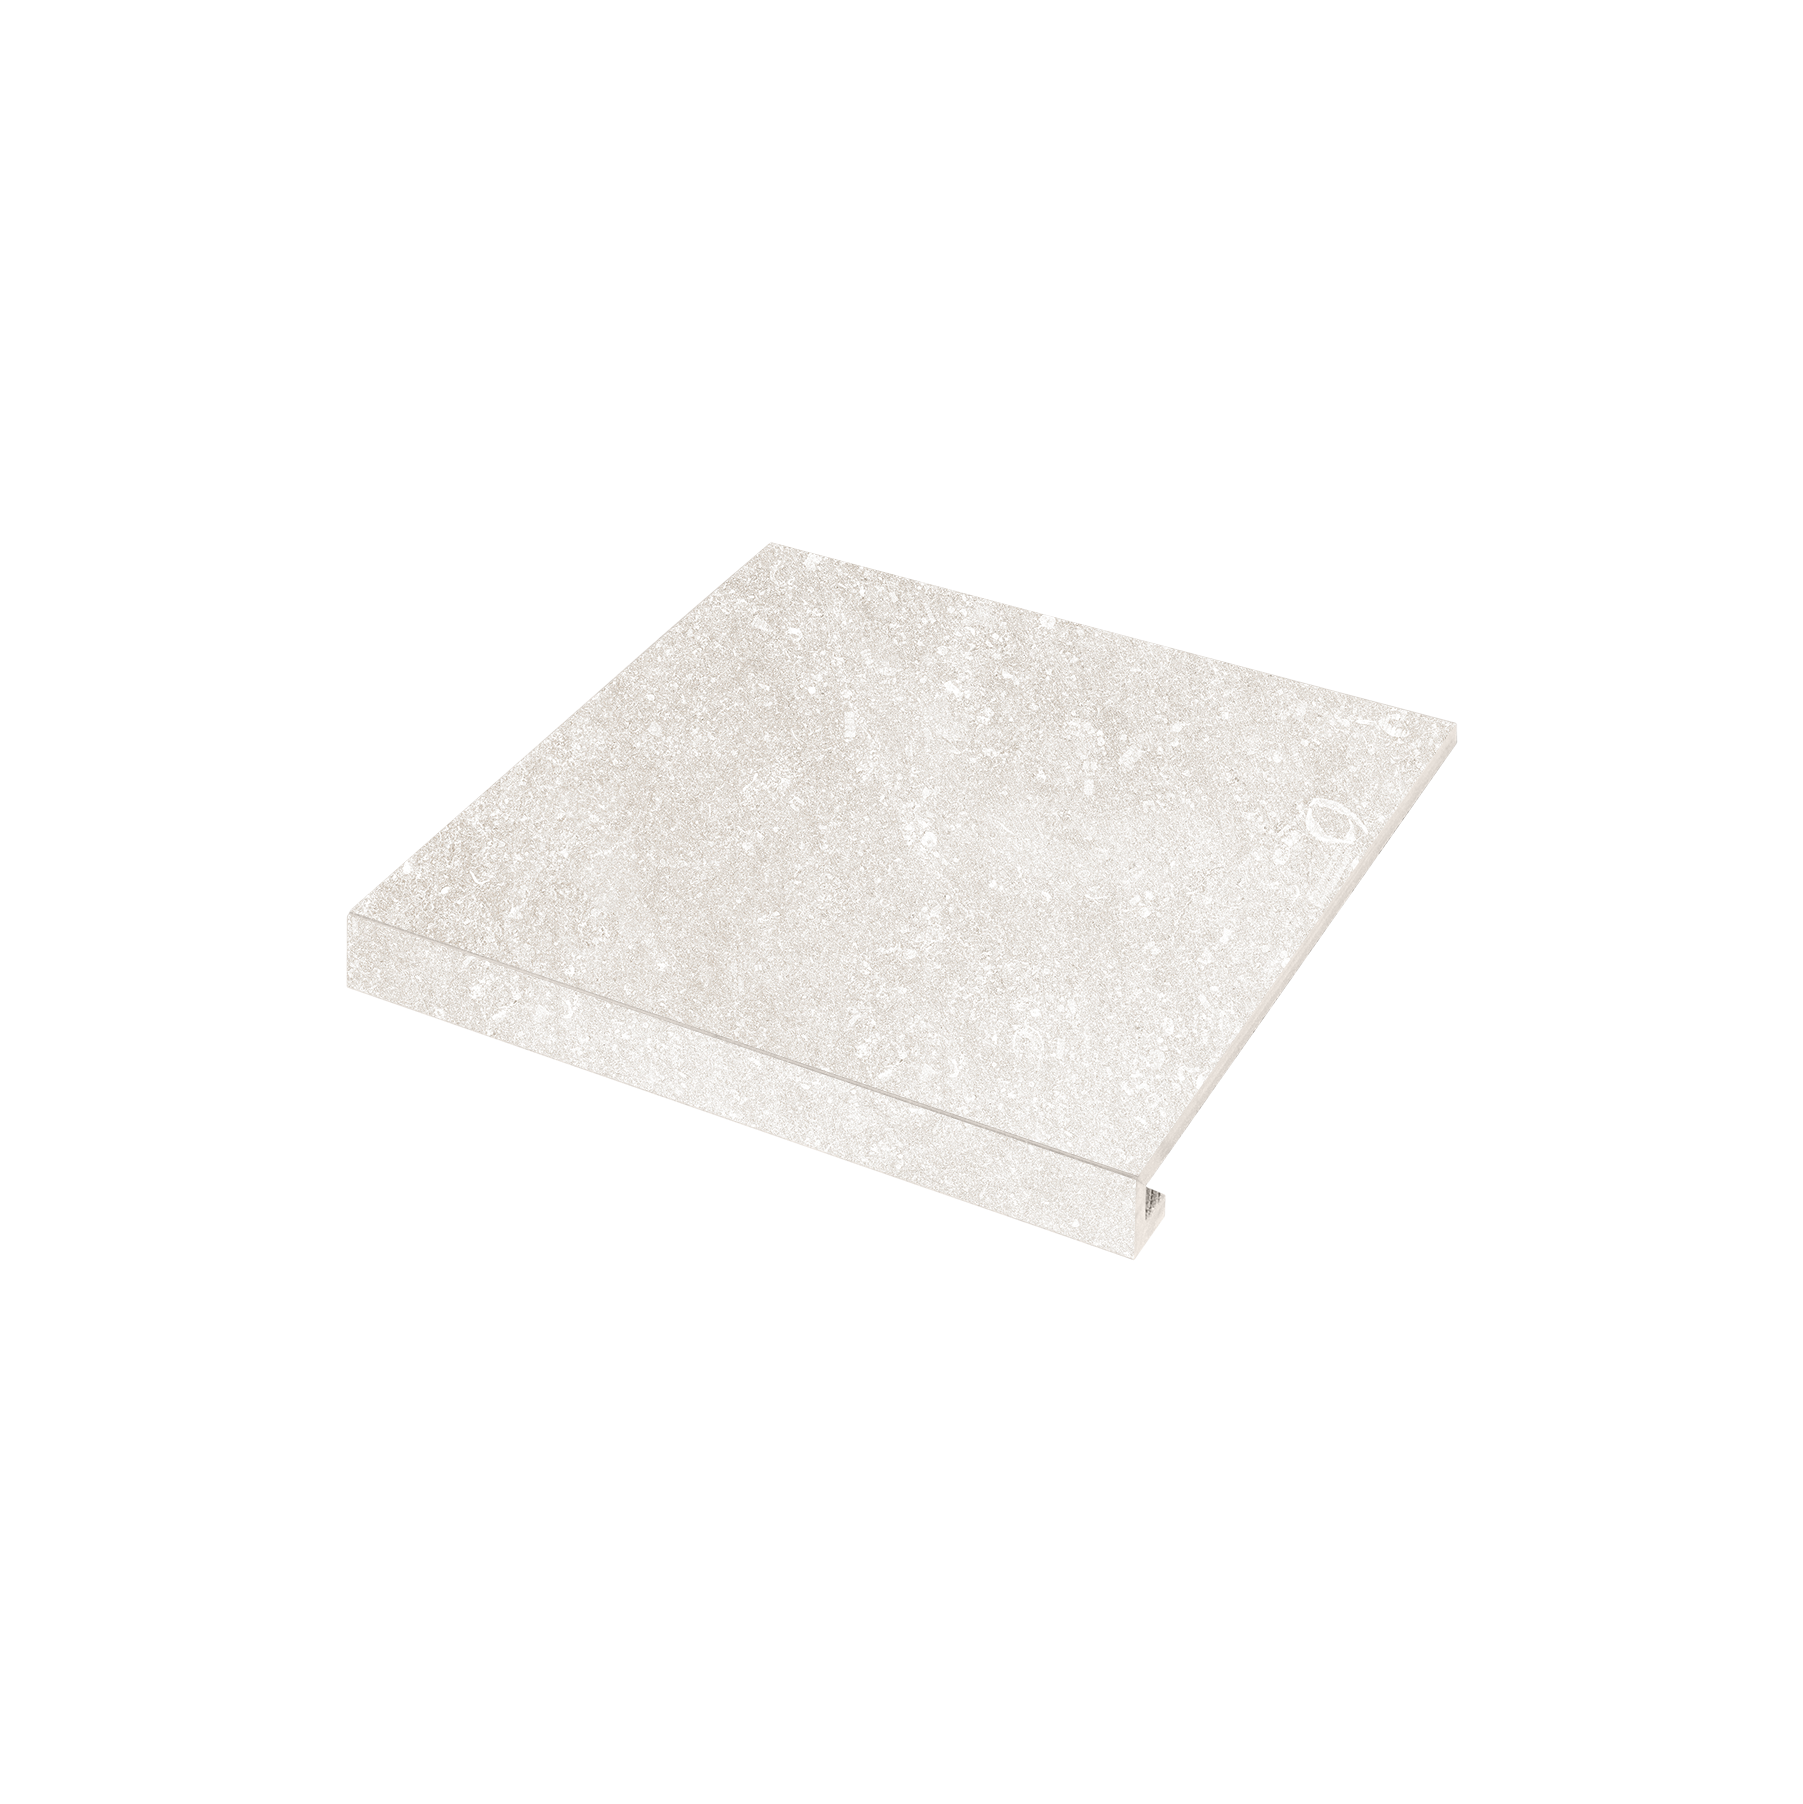 Сходинка кутова П-обр. ліва Ca' Di Pietra 345x300x35x10.2 bianco SZRXPZ1RC1